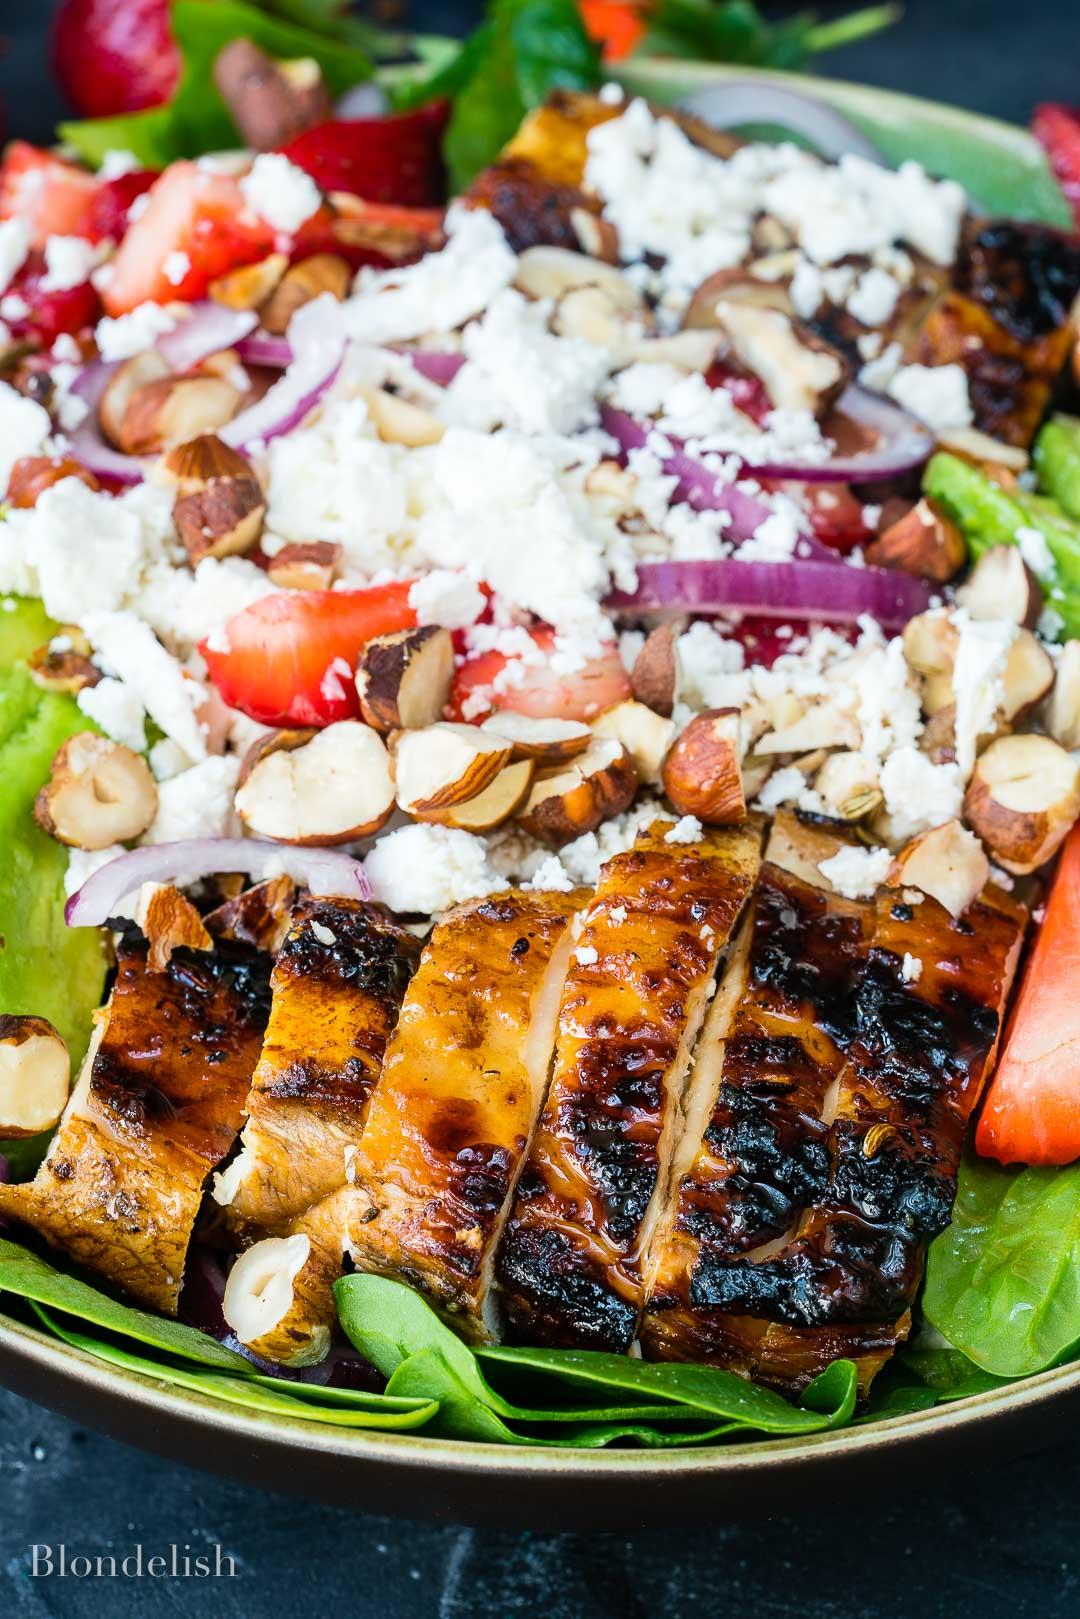 Best Strawberry and Avocado Chicken Salad Recipe 7 - How to make Chicken Salad